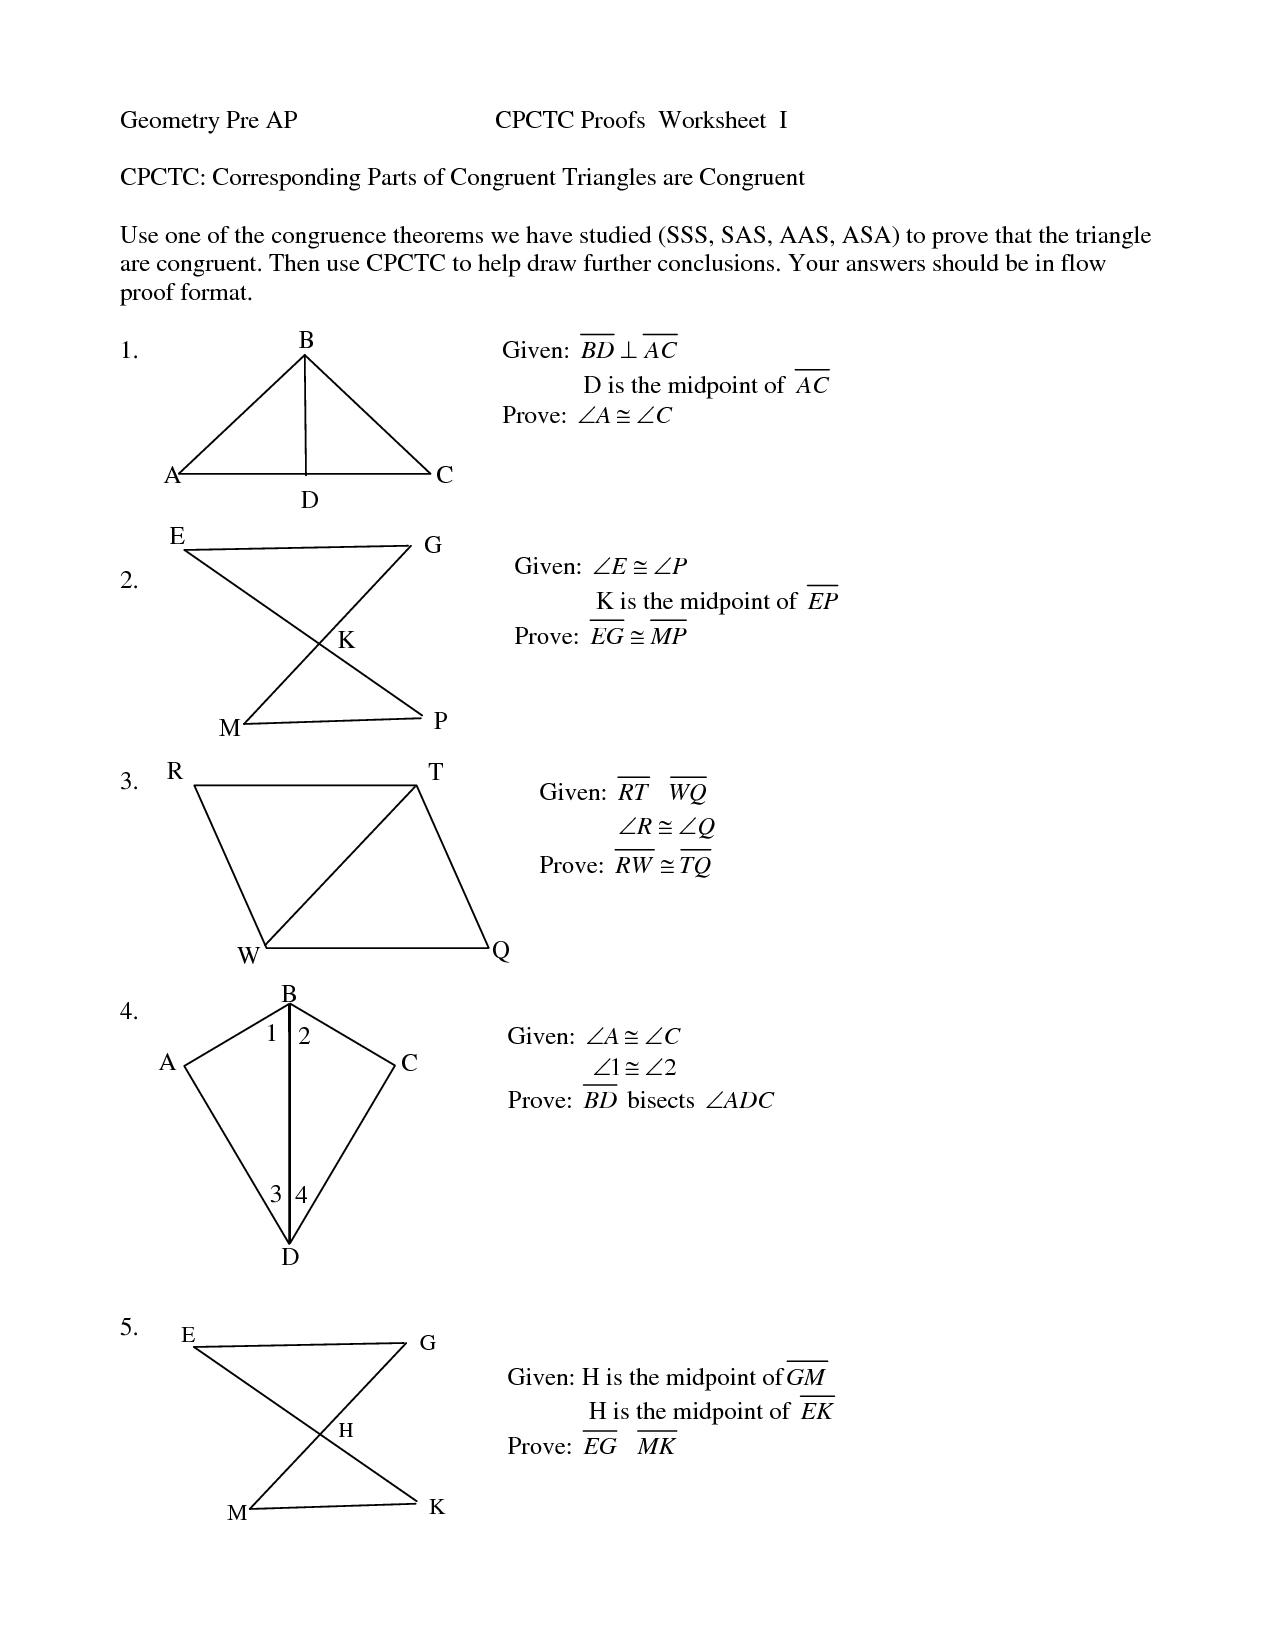 Basic Geometry Proofs Worksheet The Best Worksheets Image